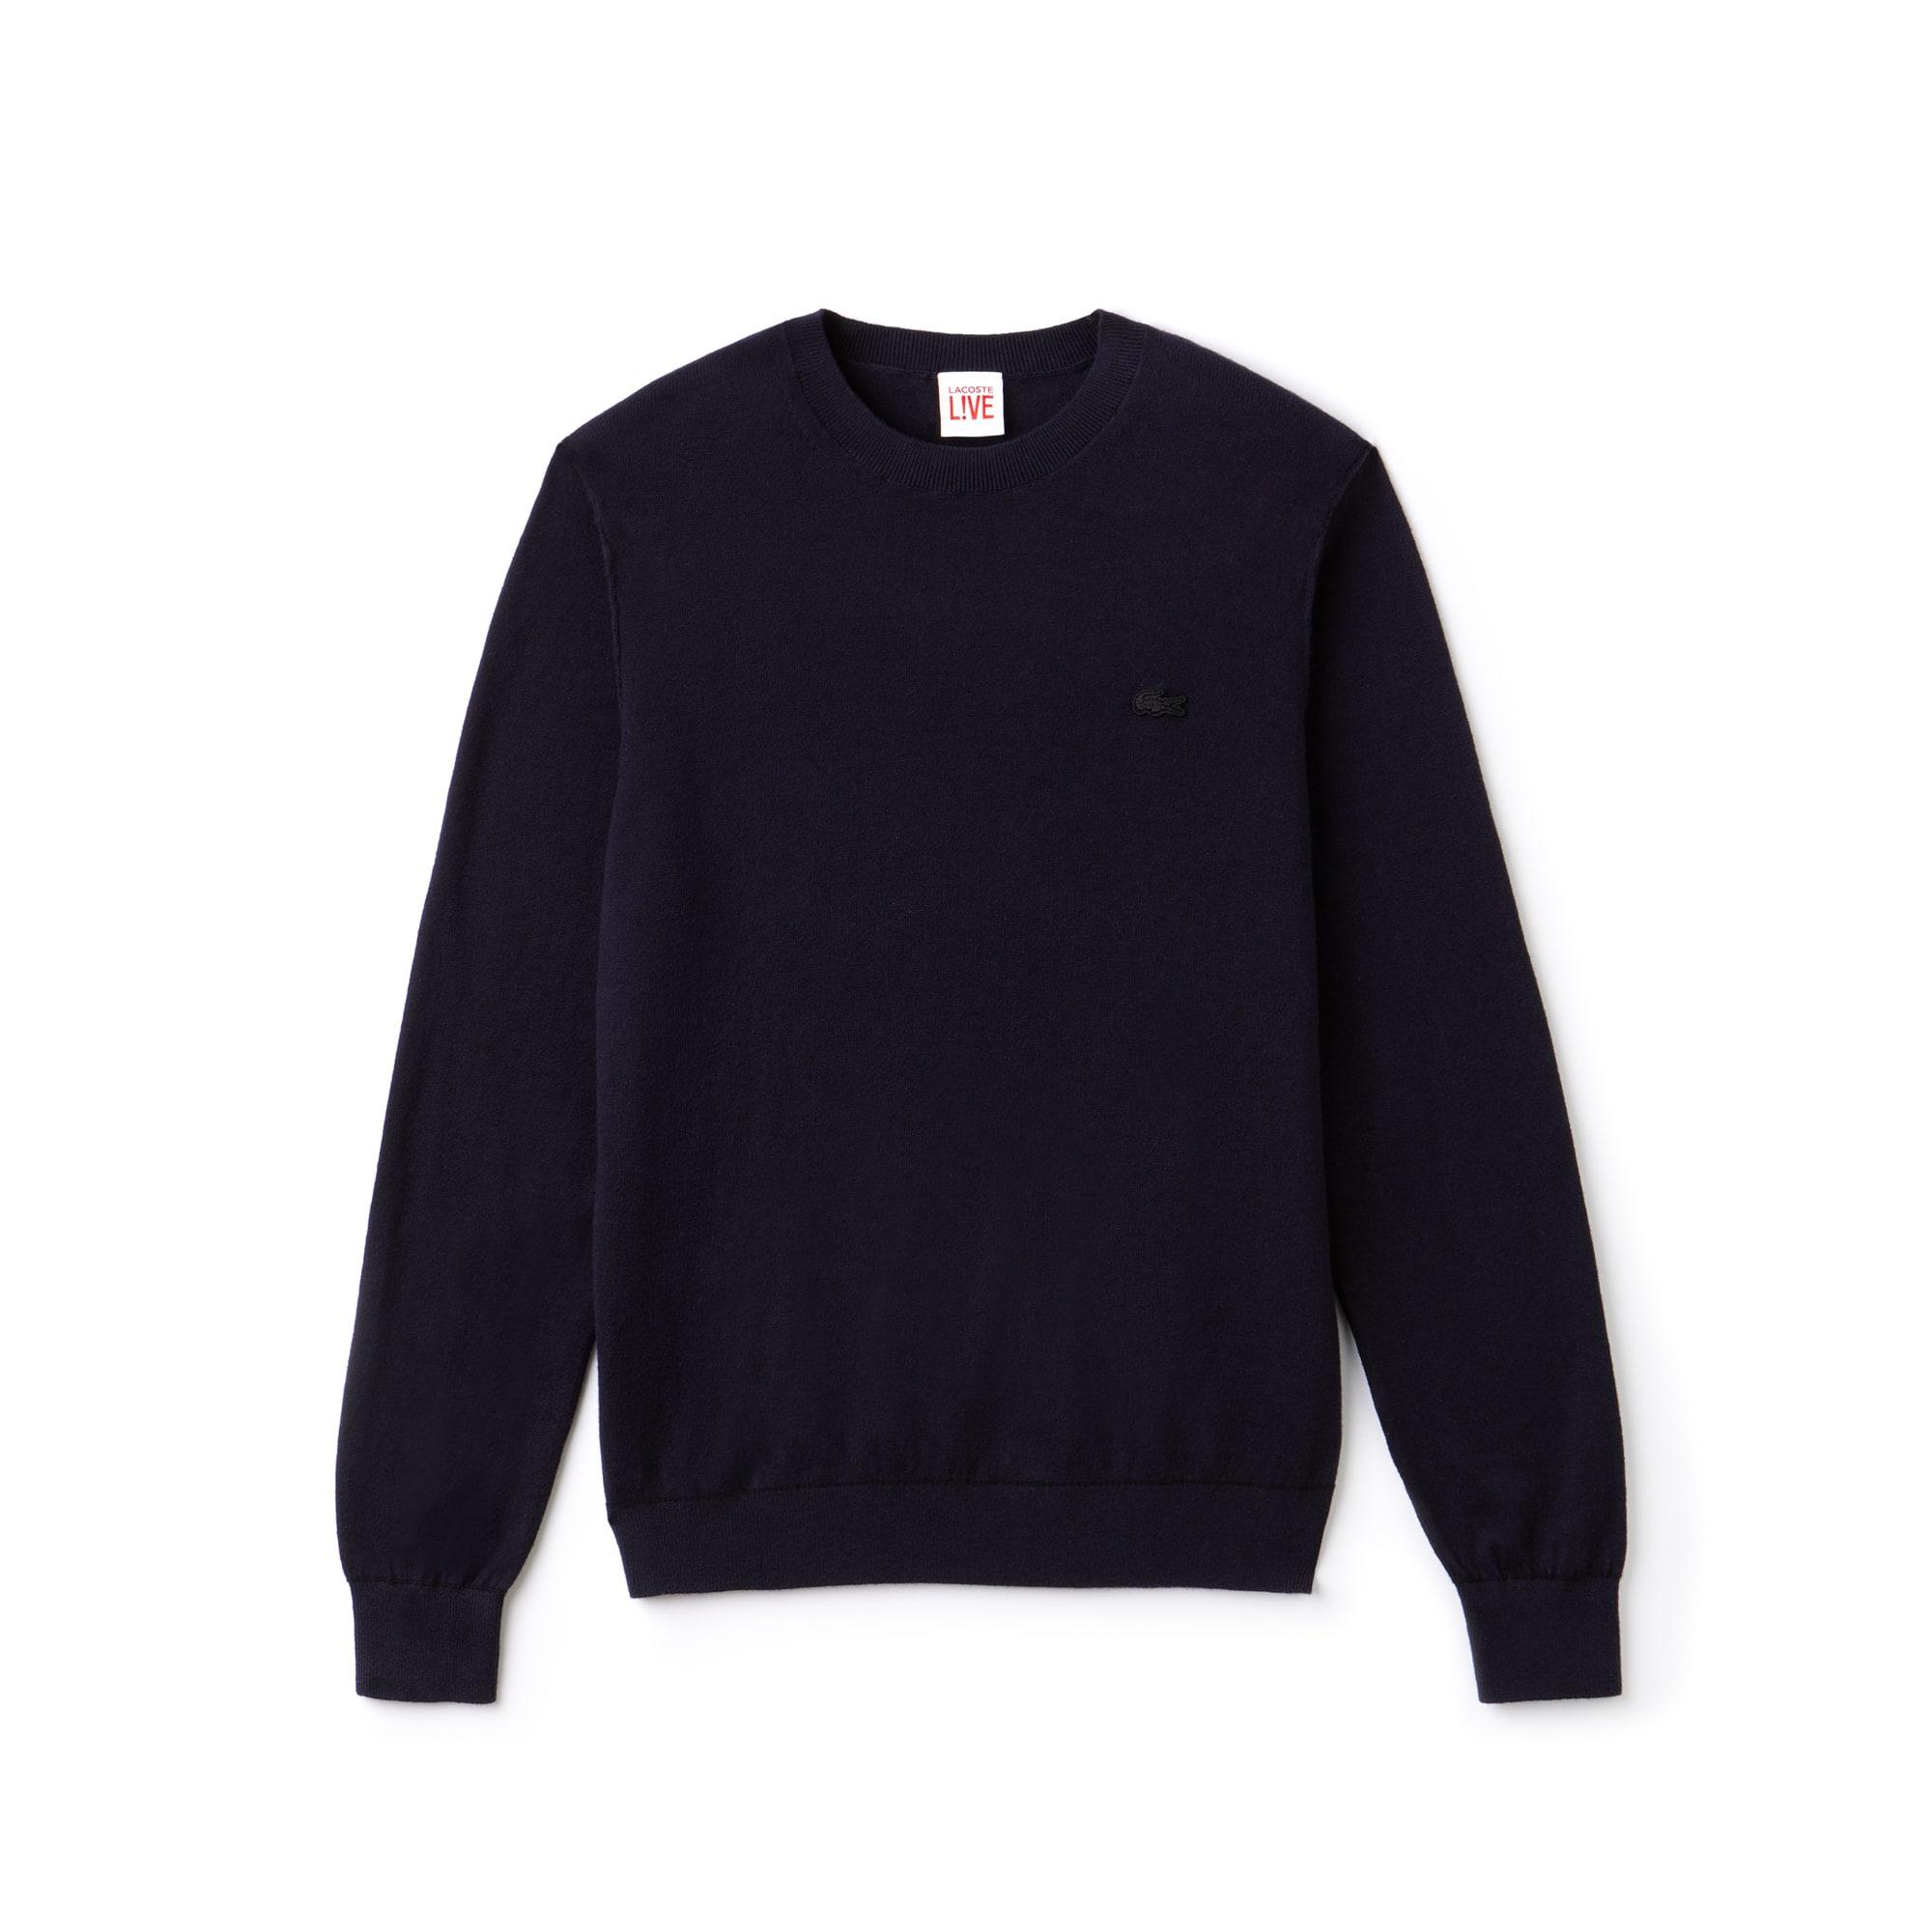 Lacoste LIVE-sweater heren ronde hals katoen en kasjmierjersey